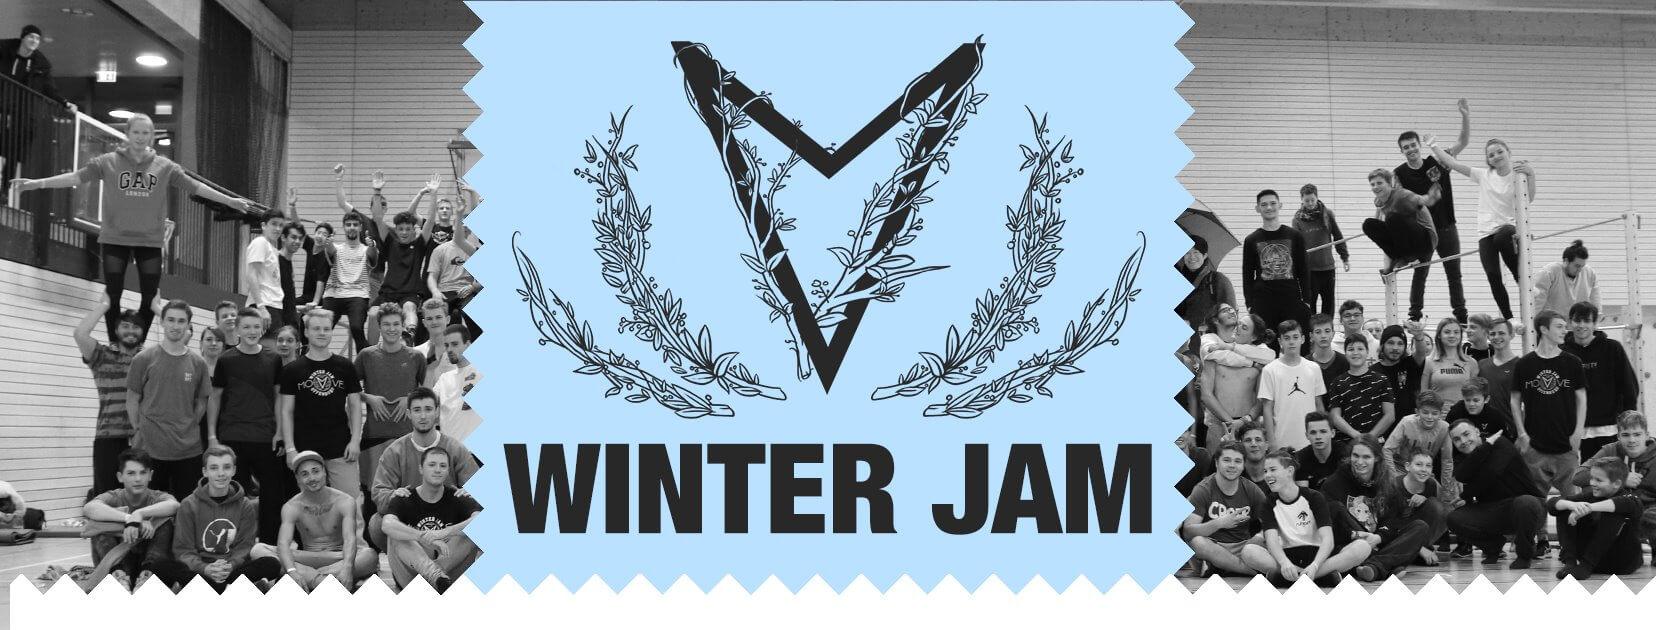 Winter JAM 2019-2020